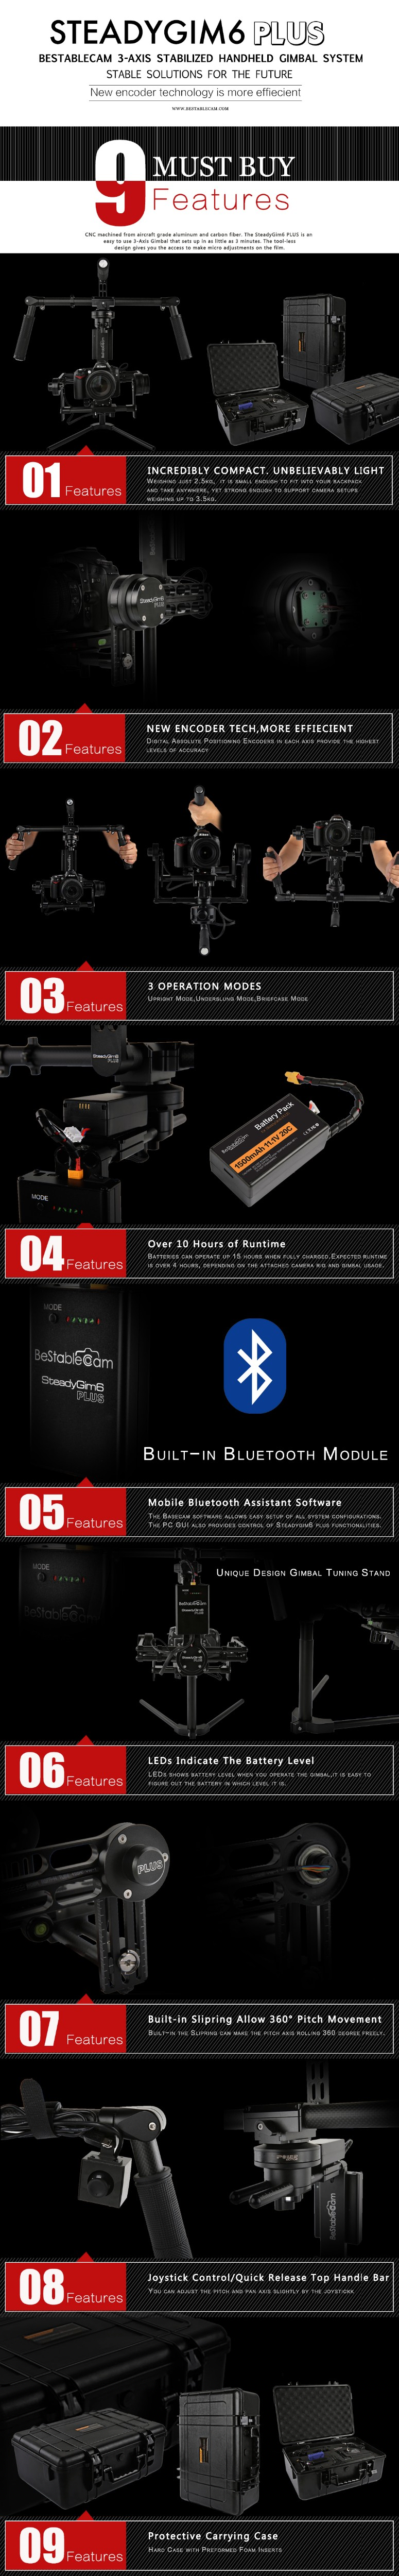 HORIZON HF3 3 axis Handheld Brushless Smartphone Gimba Free Gift Free DHL EMS